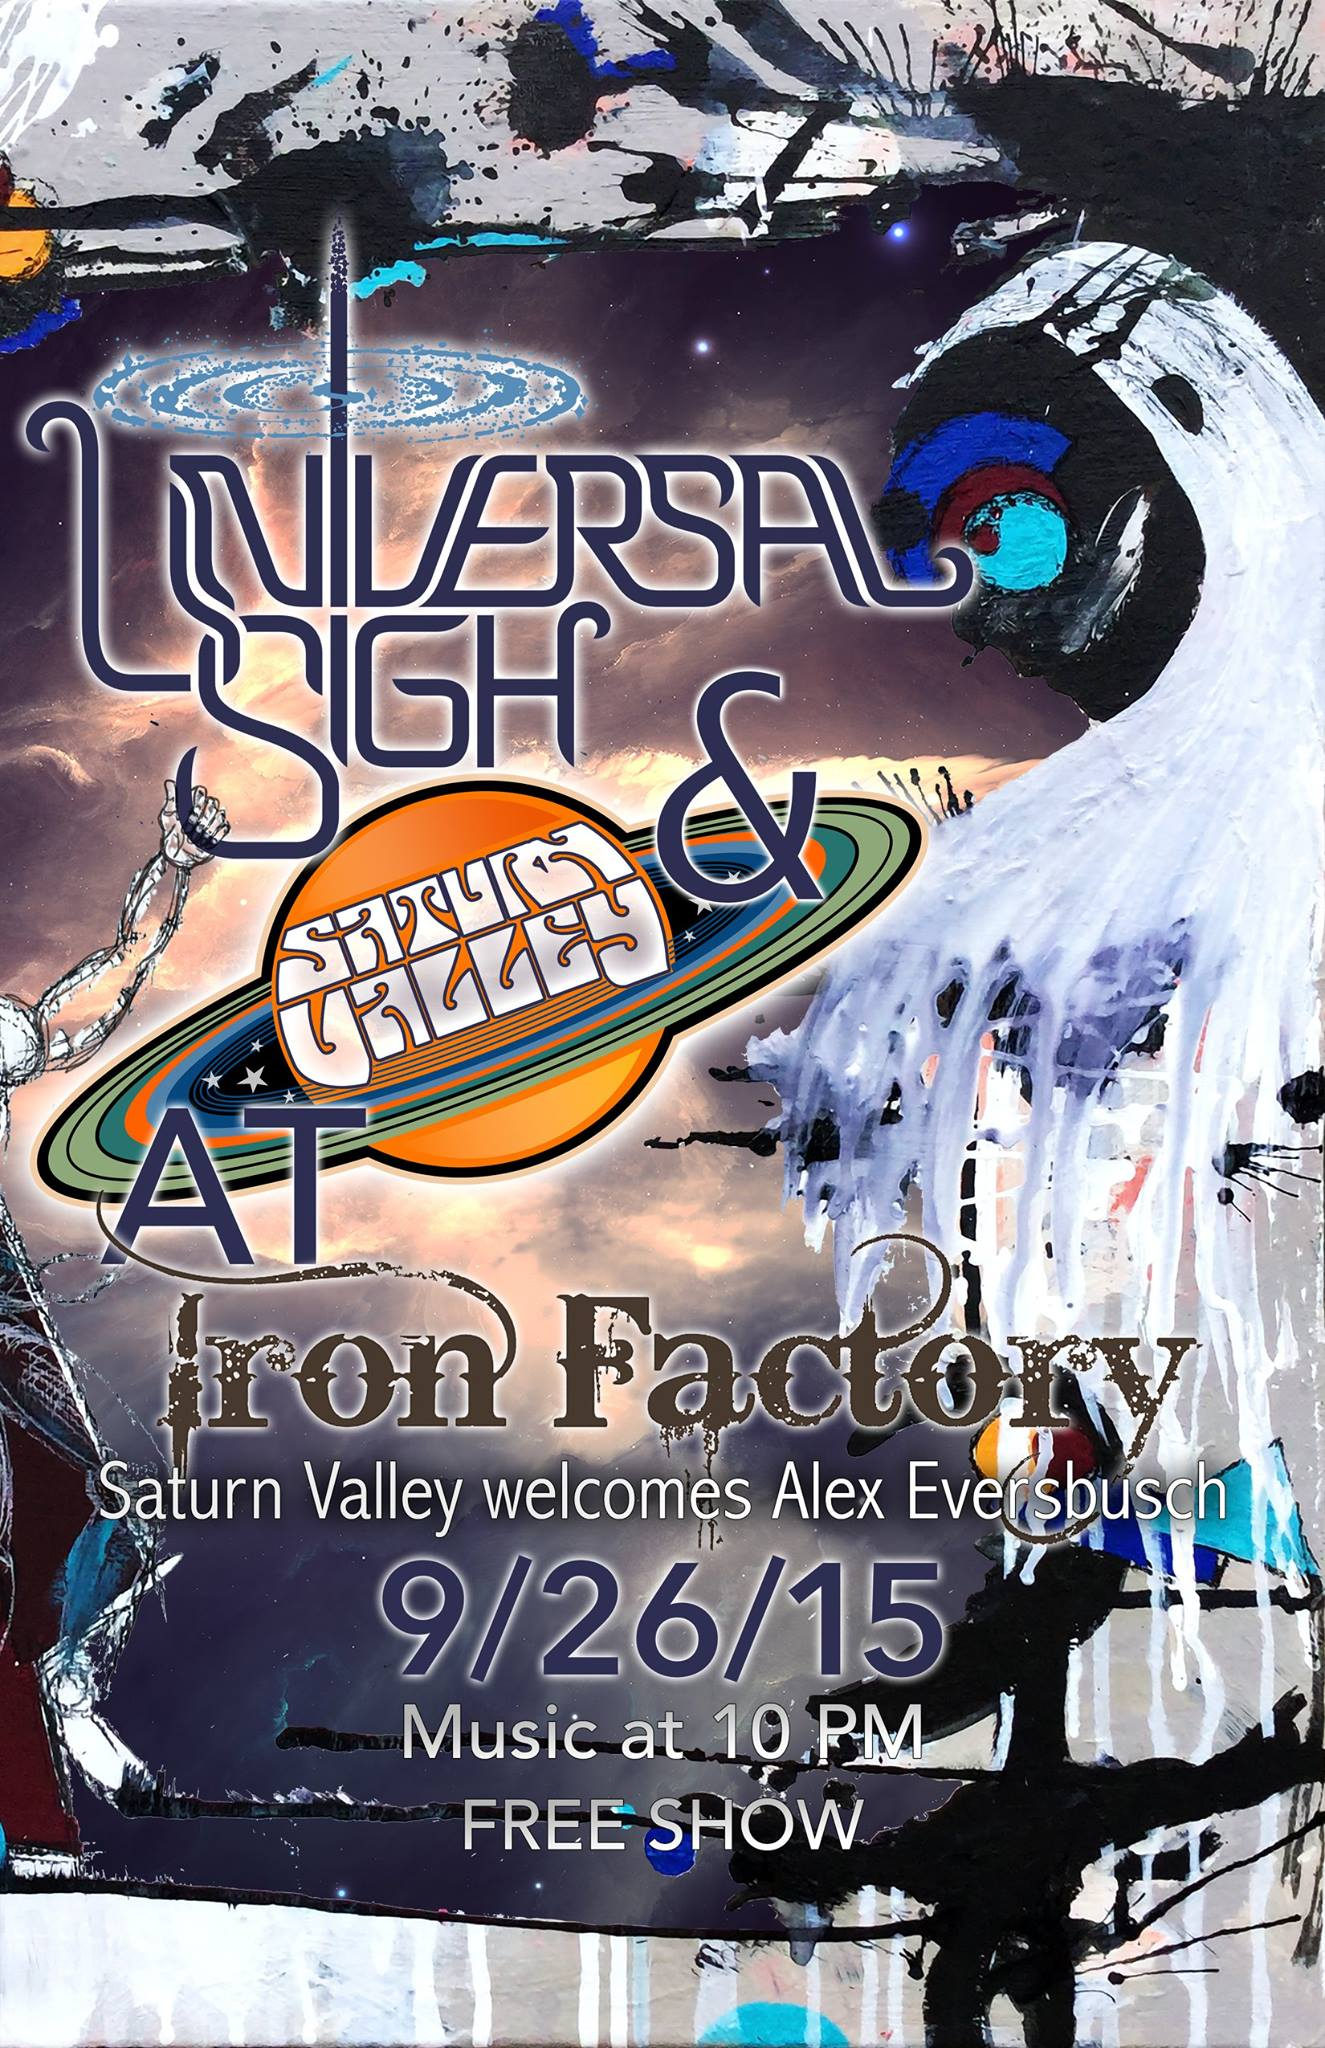 Iron Factory 2.jpg